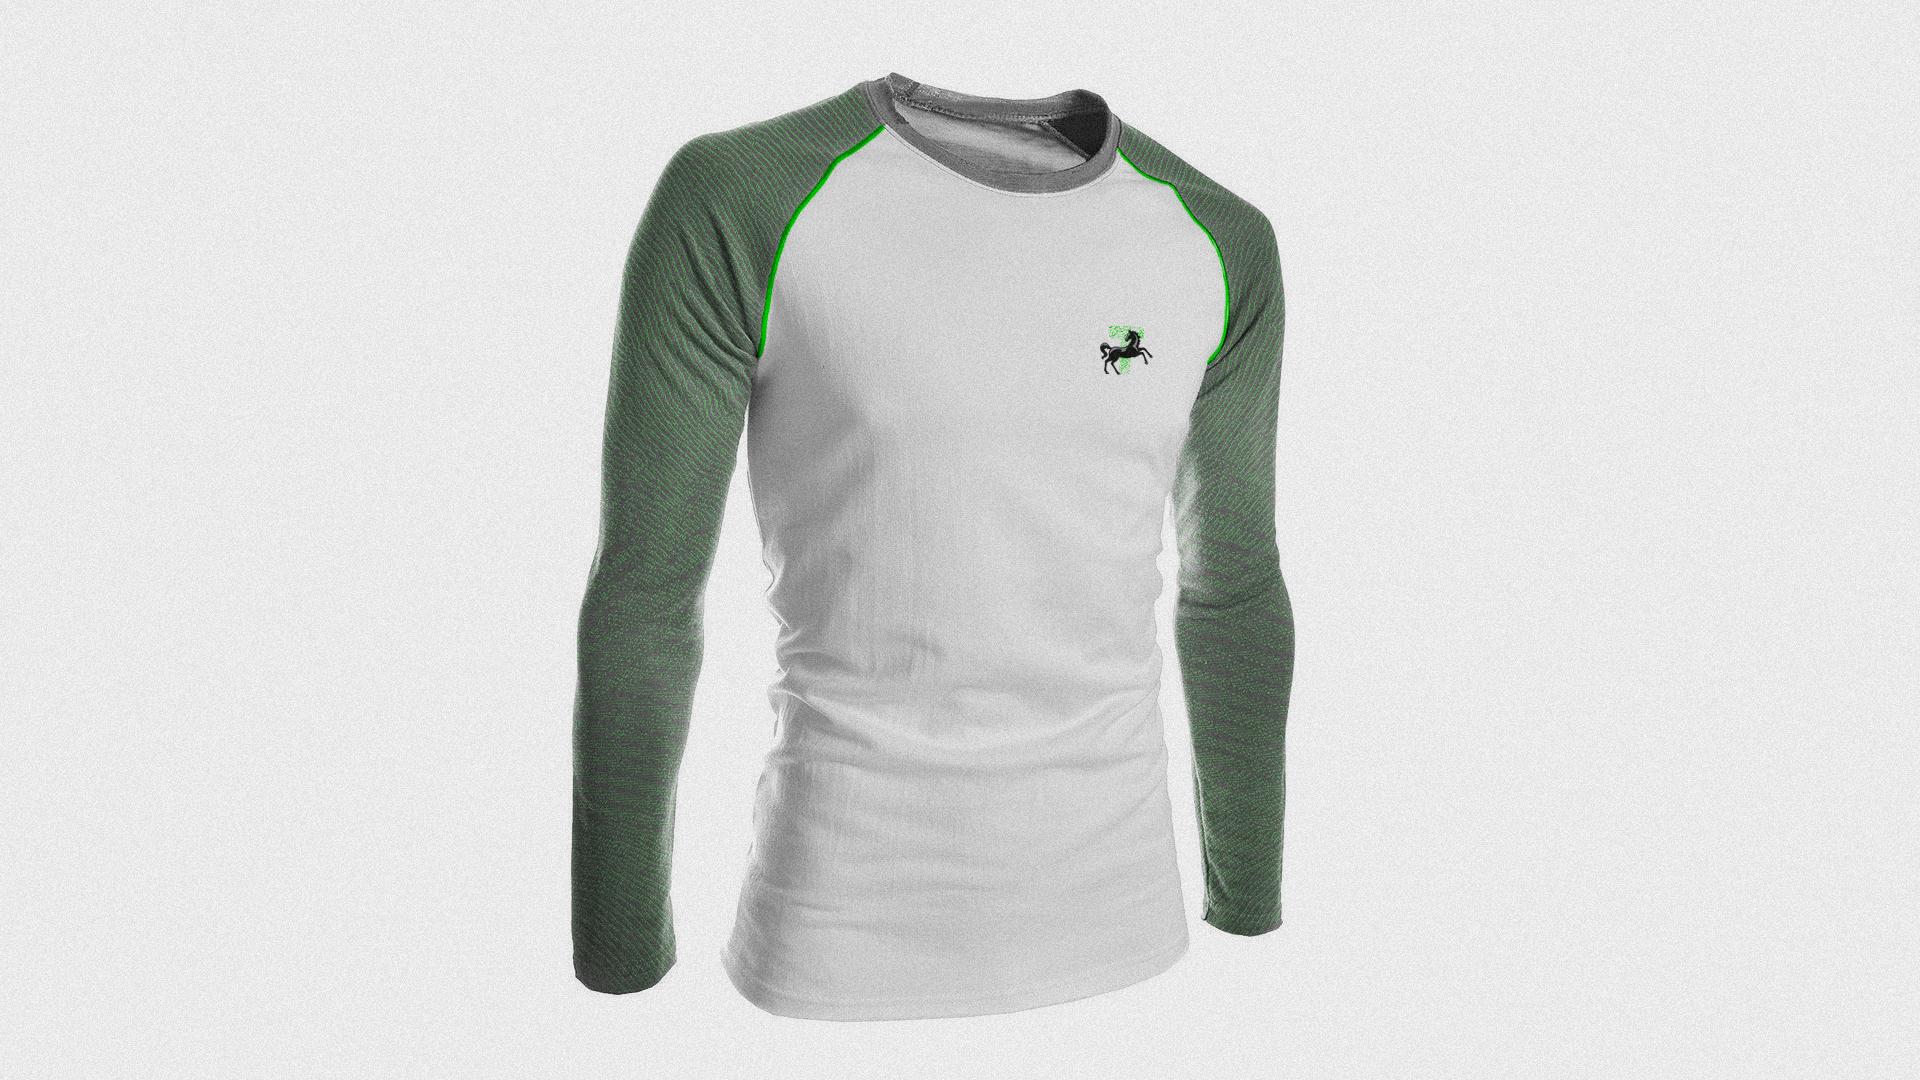 LLOYDS-GroupTech-Tshirt-01